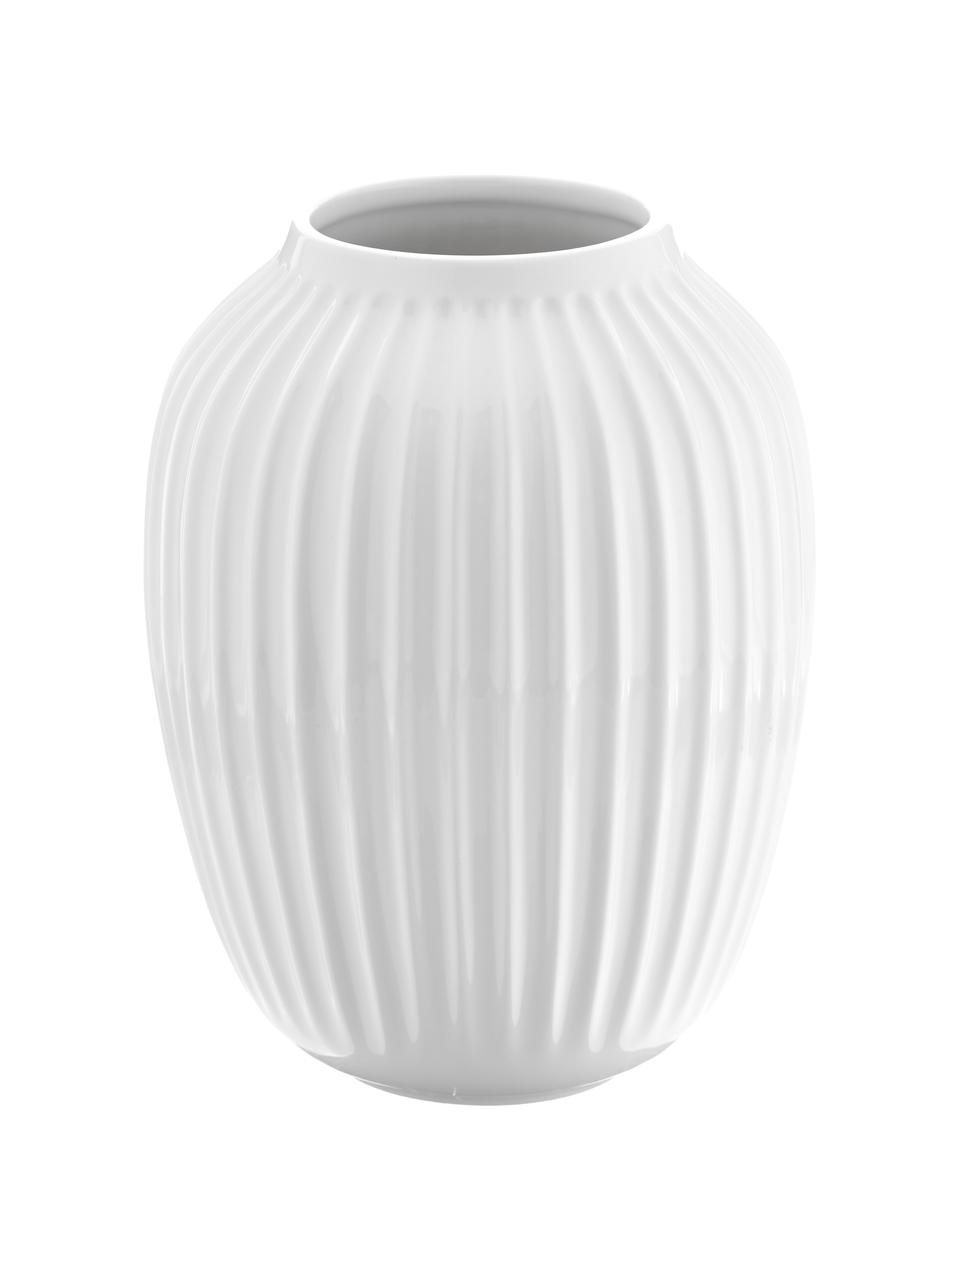 Vaso di design fatto a mano Hammershøi, Porcellana, Bianco, Ø 20 x Alt. 25 cm